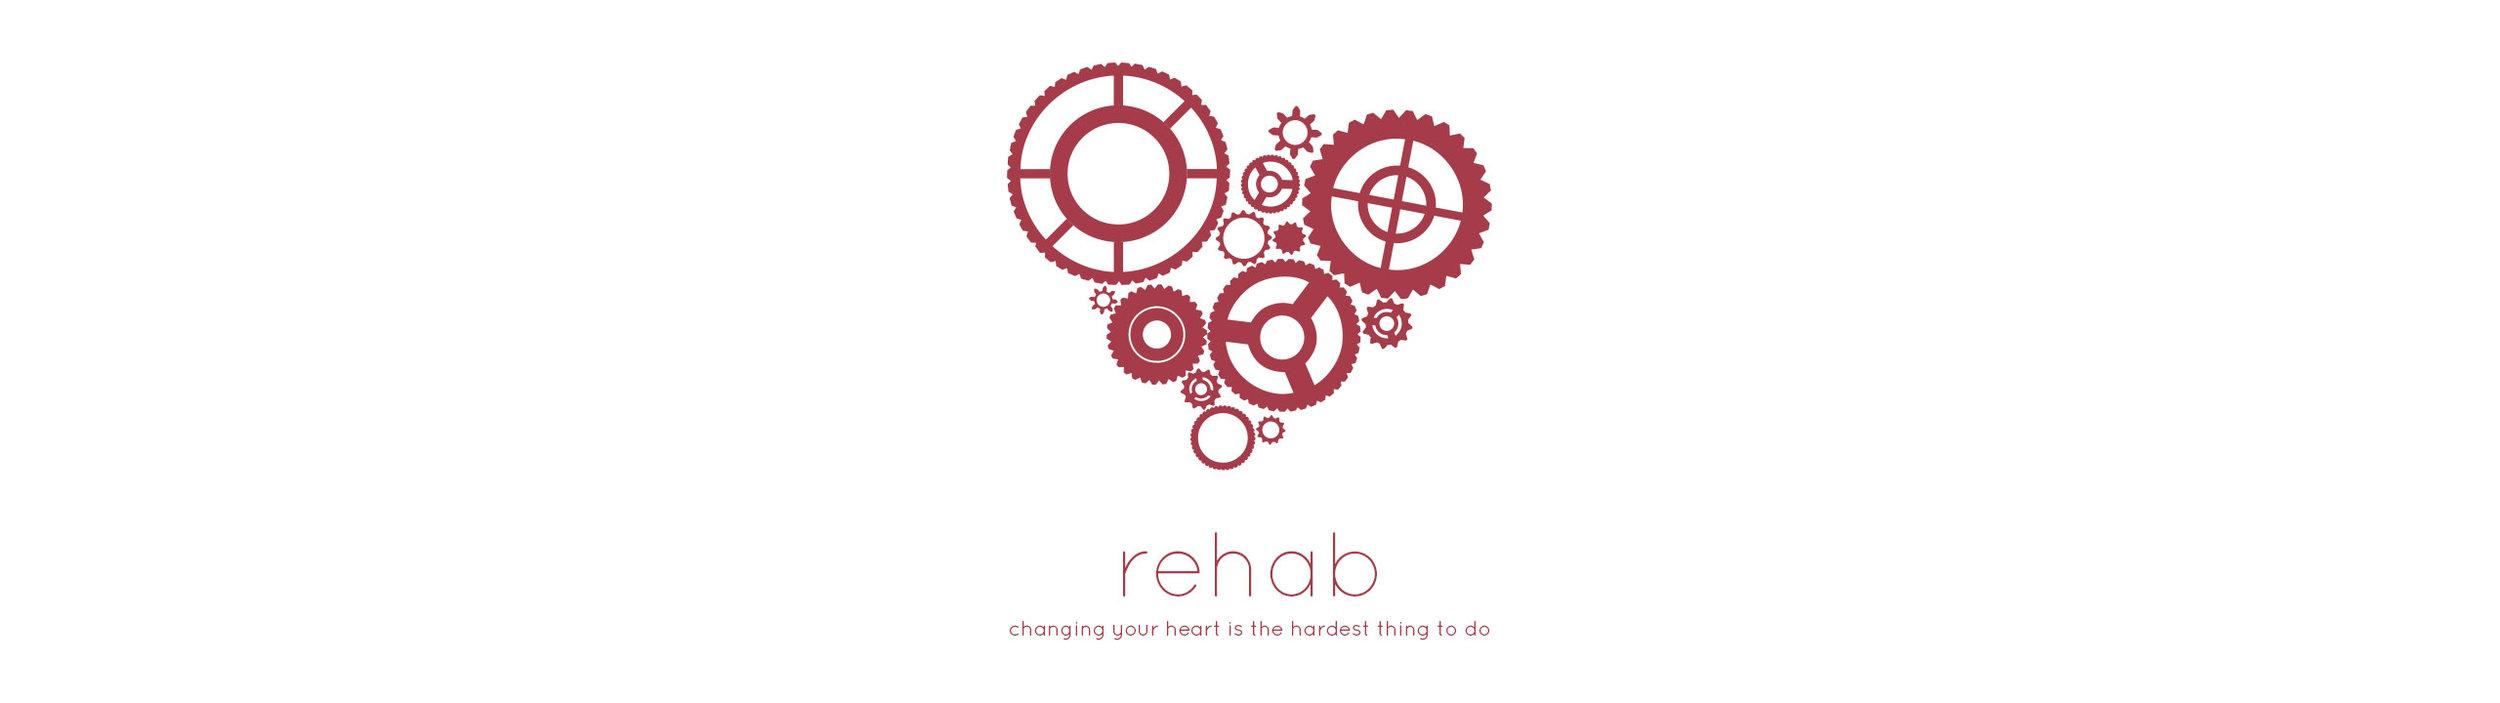 Rehab Sermon Series art from Hulen Street Church in Fort Worth, TX